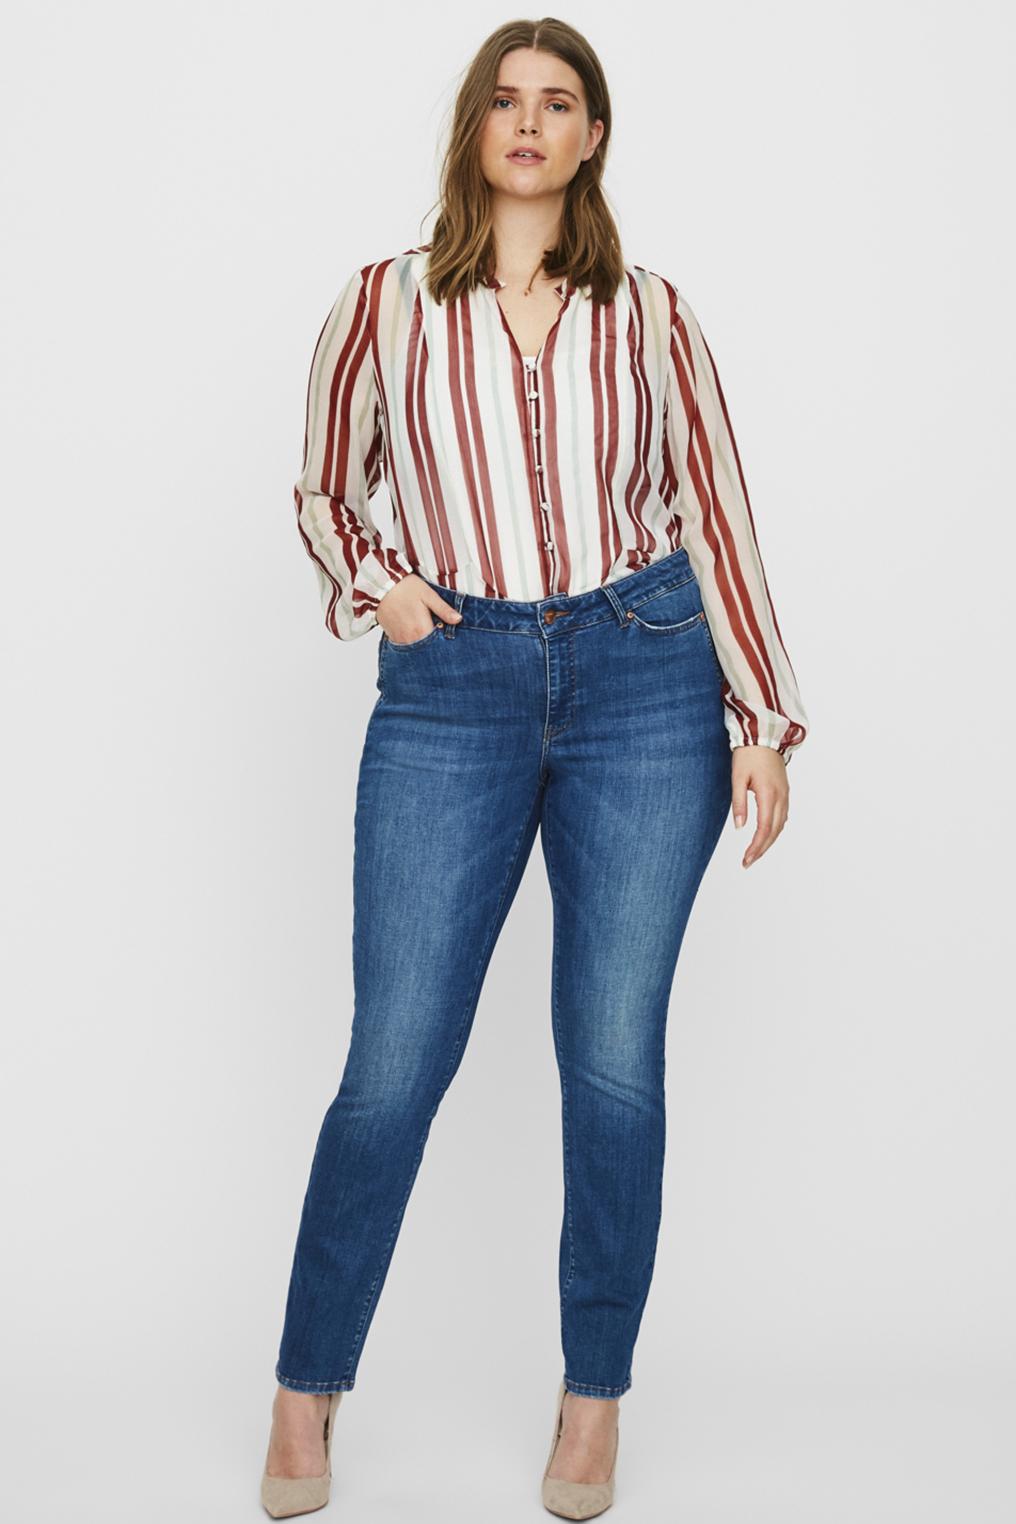 Jeans FIVE Junarose aparte zakinzet